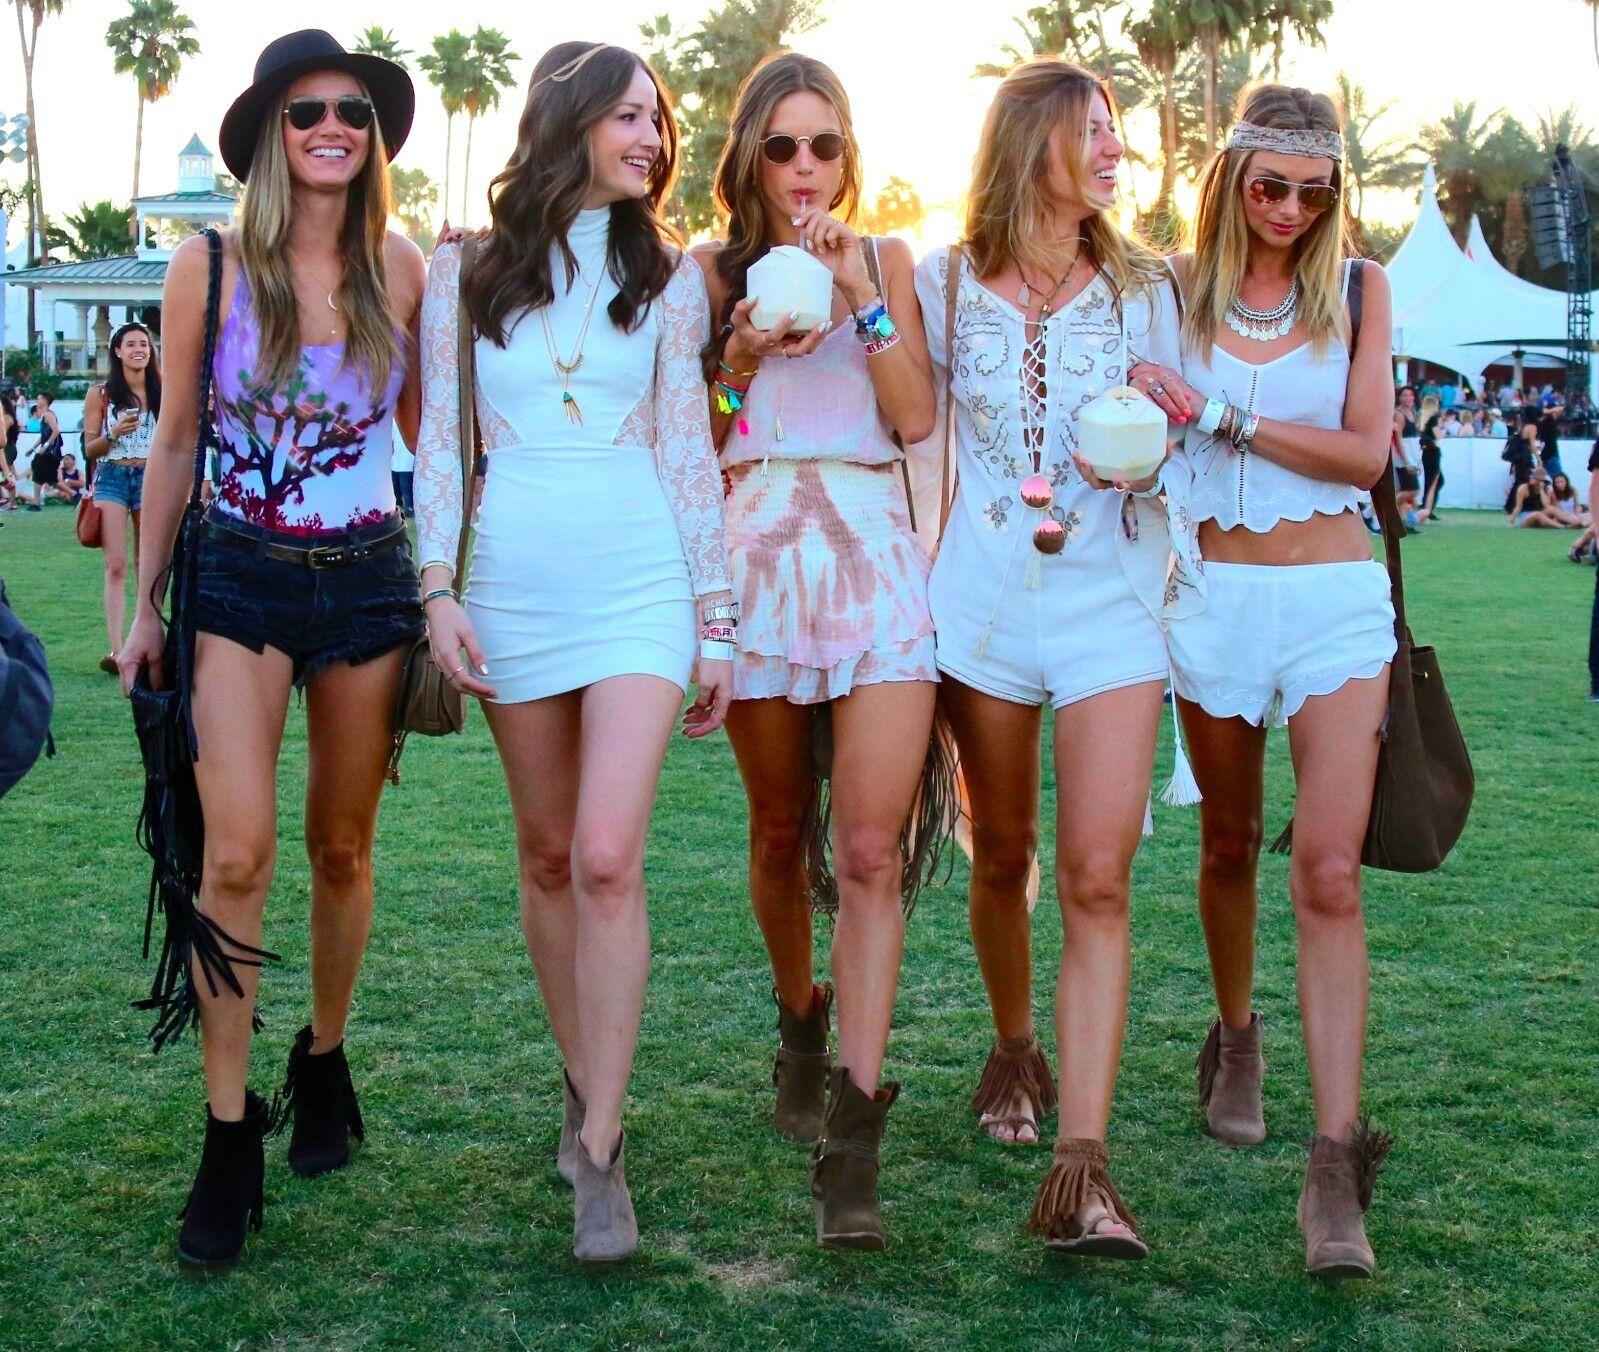 WEEKEND 1 - Coachella 2019 - 2 VIP TICKETS + 2 SHUTTLE PASSES - APRIL 12-14